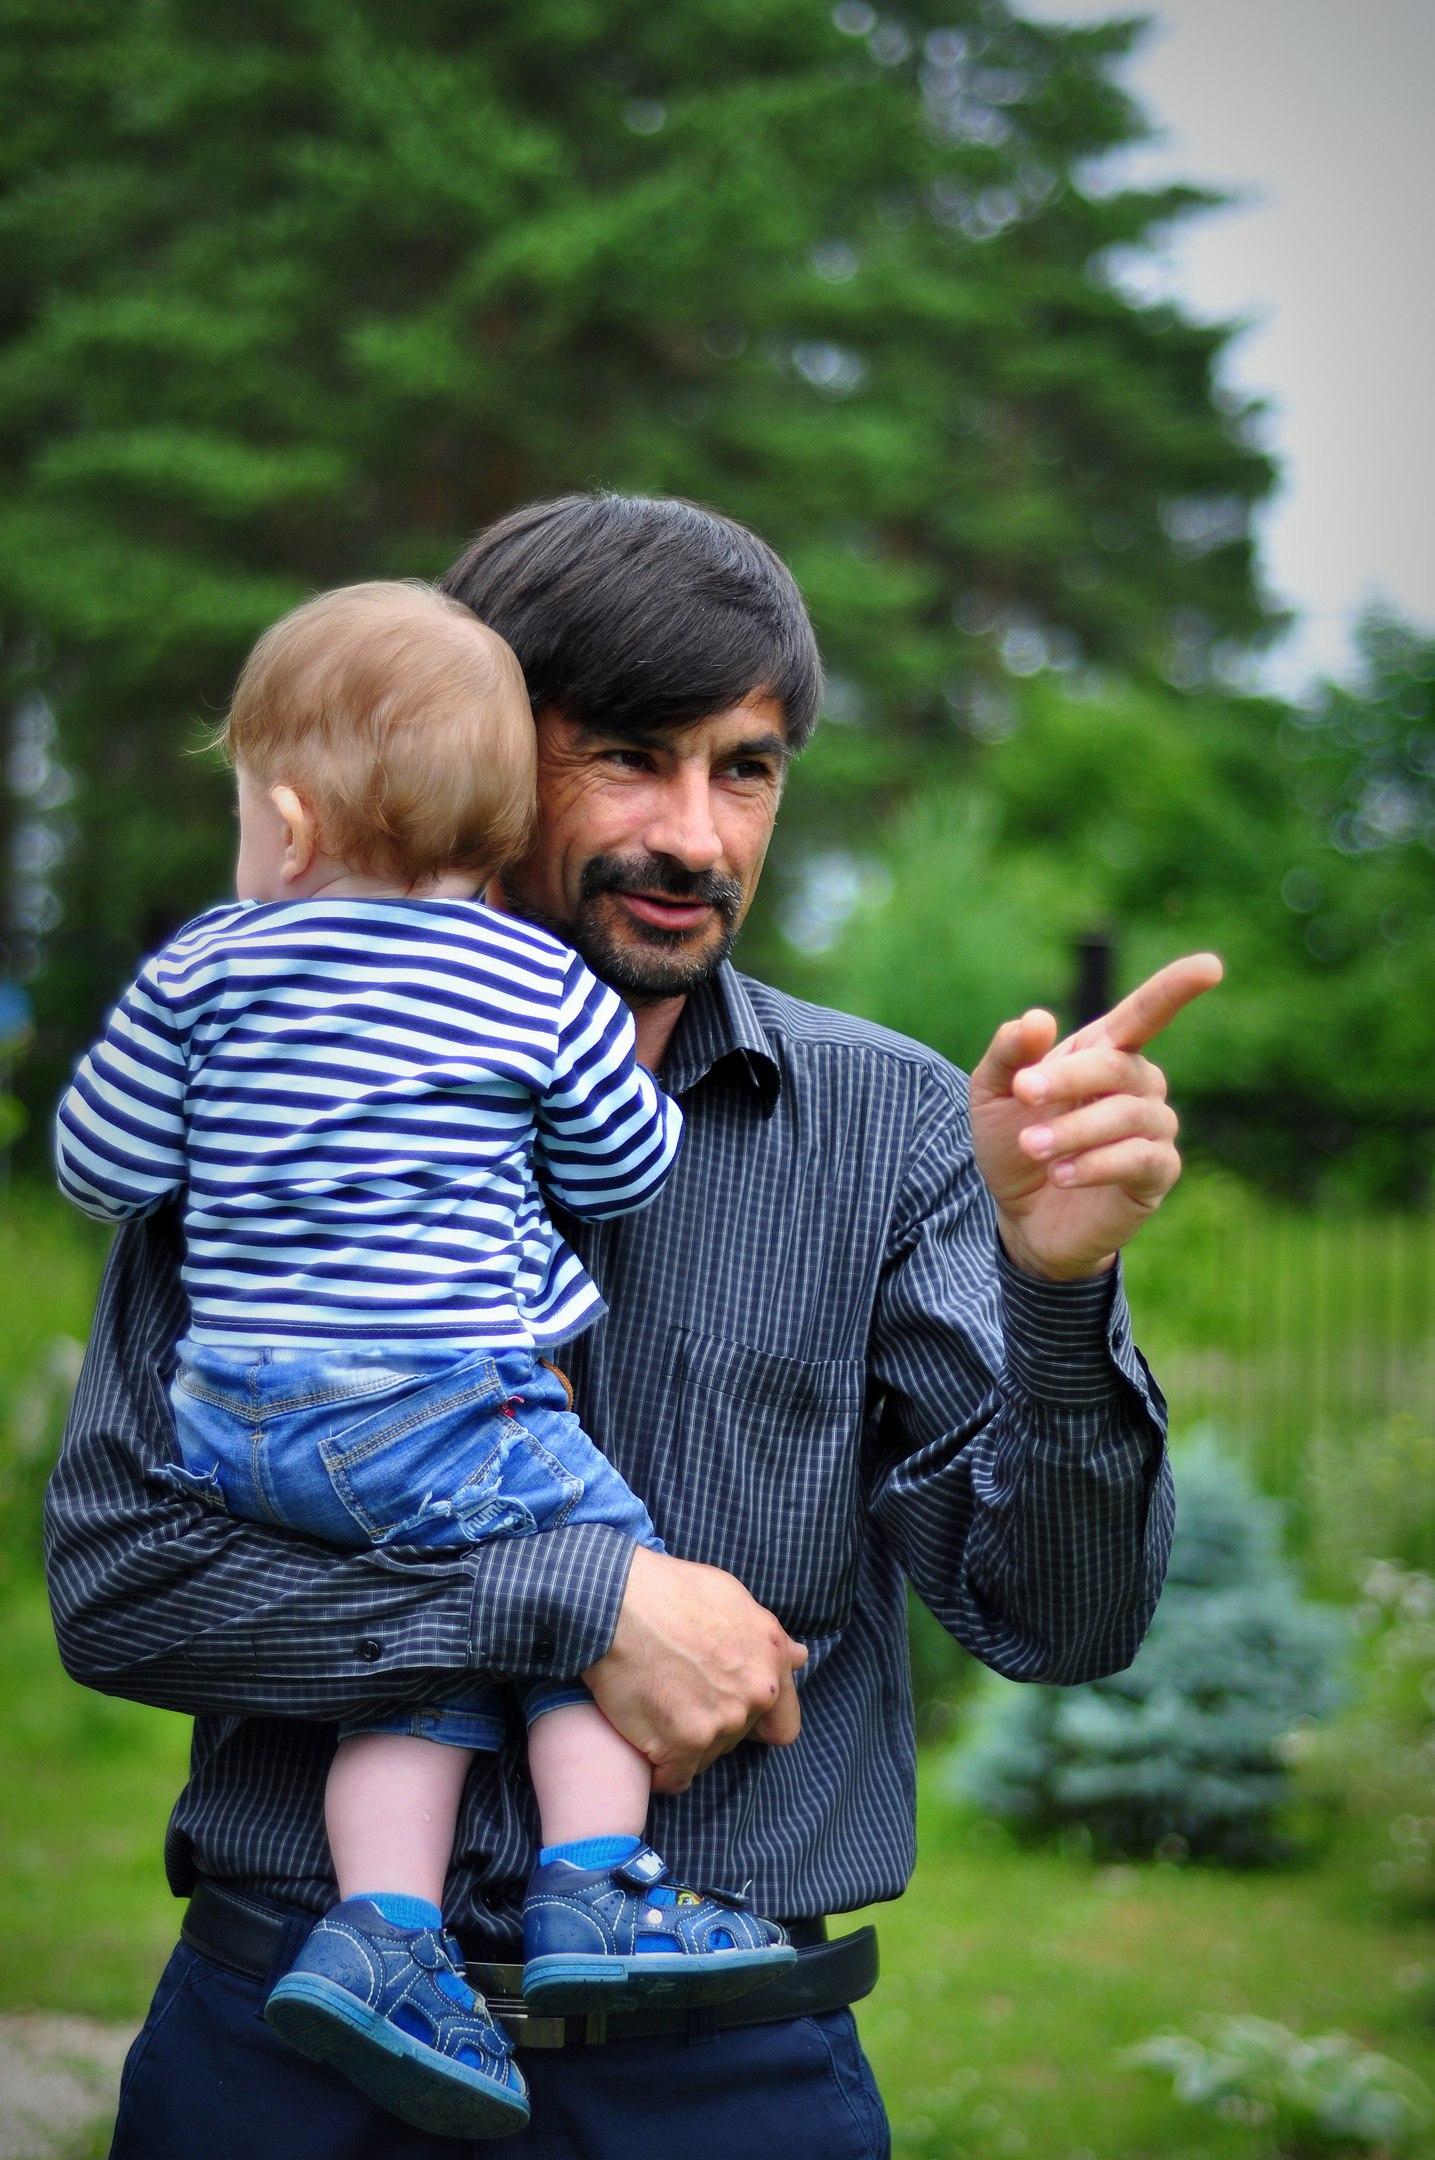 24.06.2016, фото Оксаны С., 14